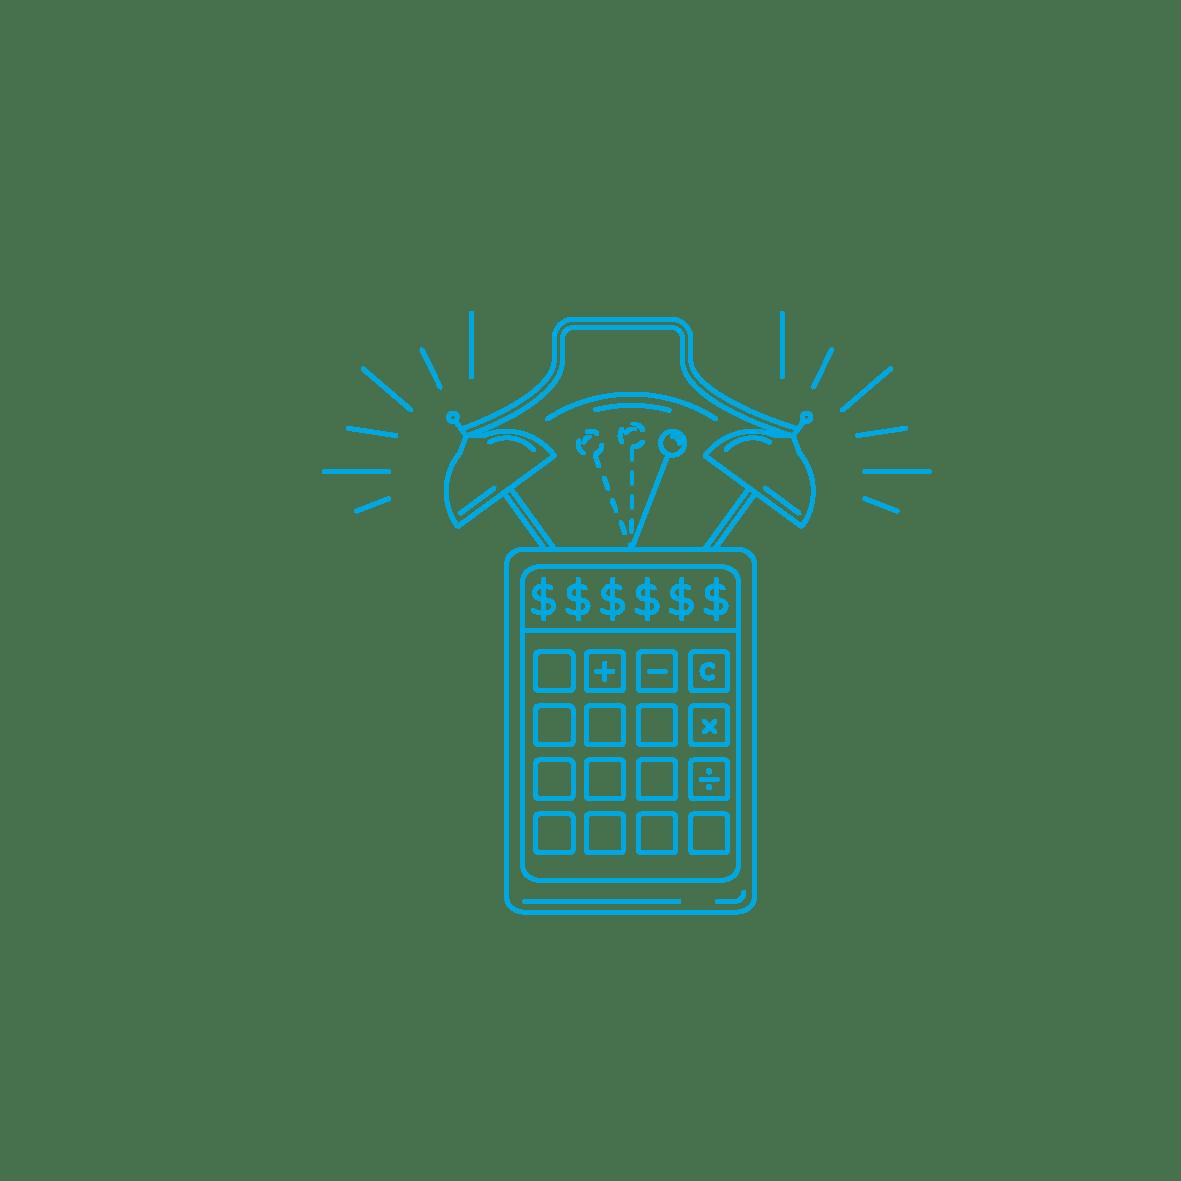 basic_illustrations-10-tax_alert.png